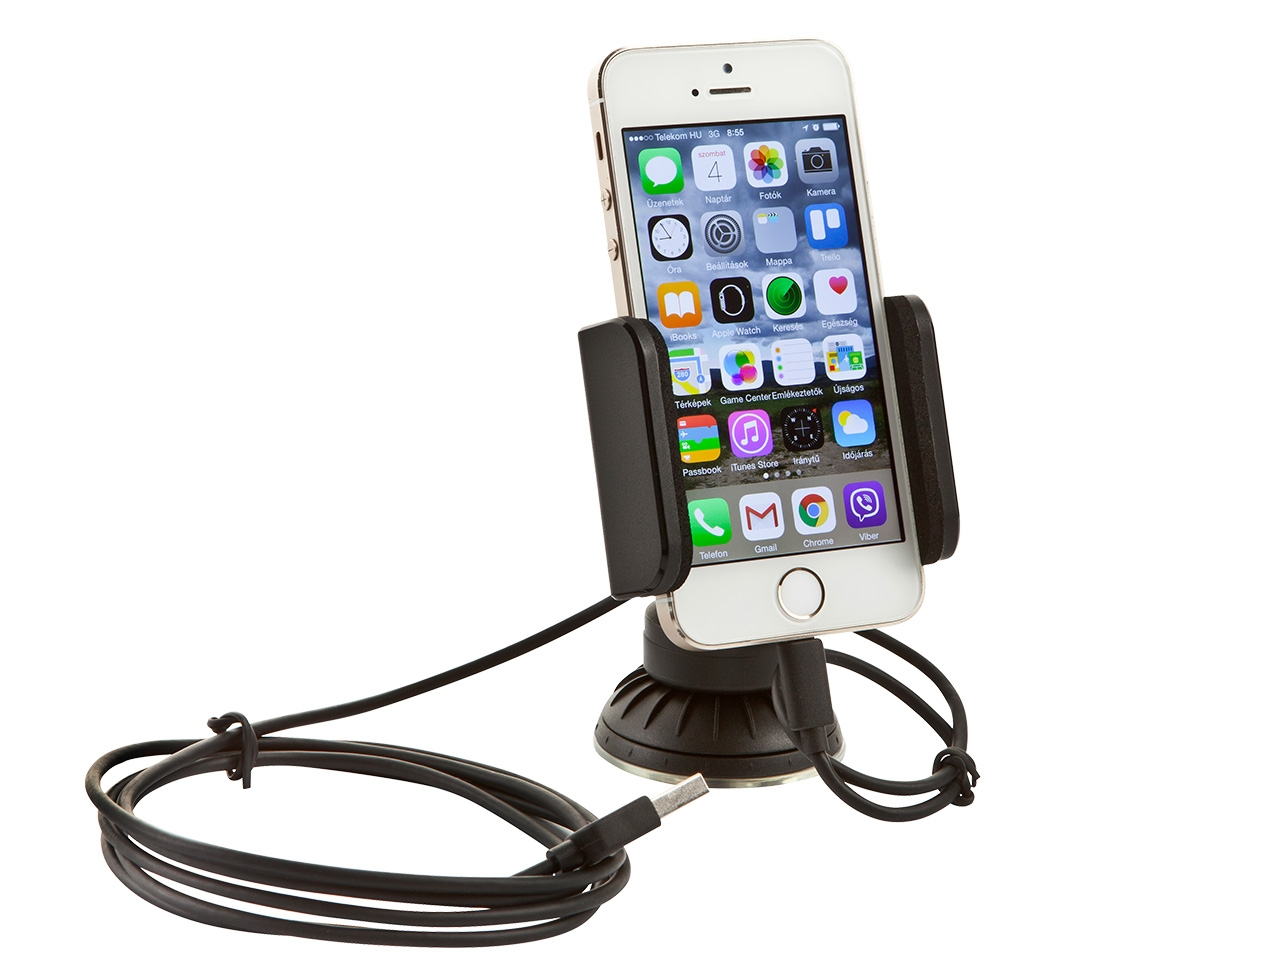 Iphone Car Dock: Car Dock 2 For IPhone